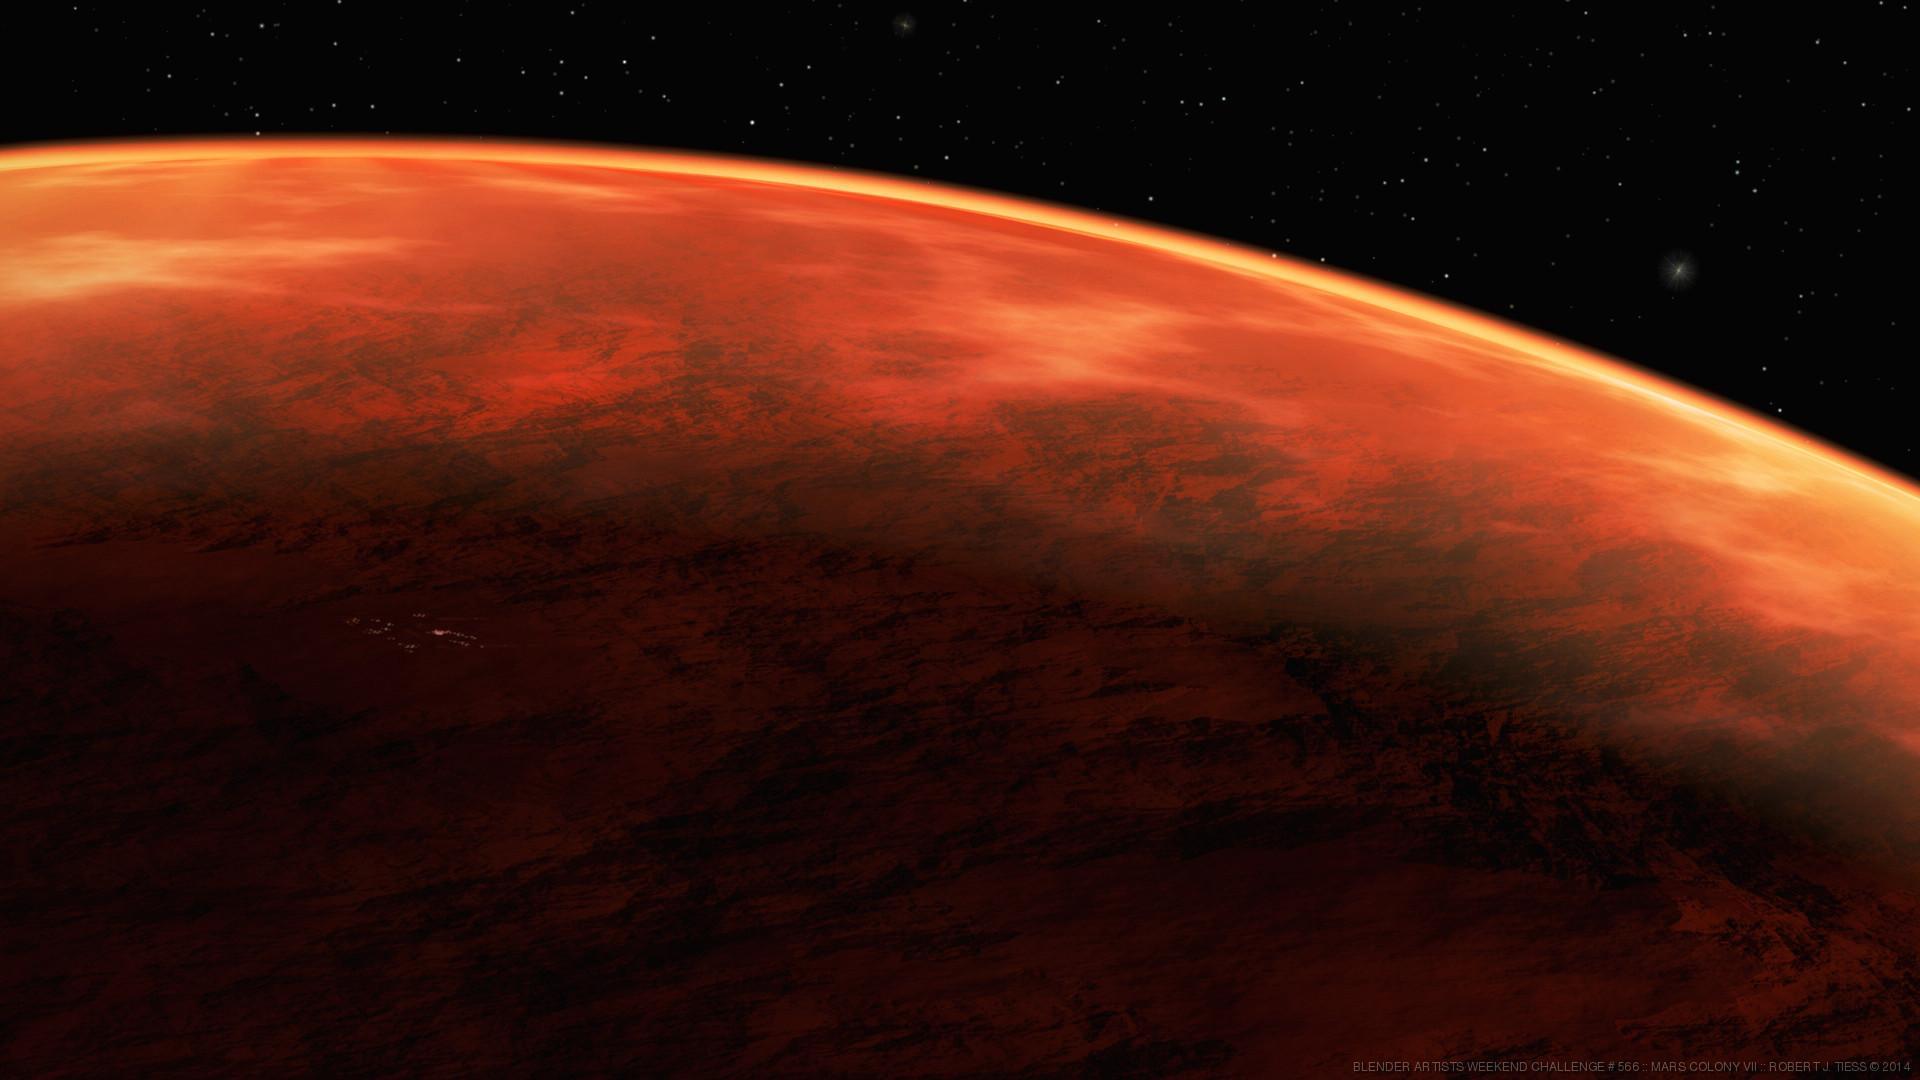 Mars Colony VII - By Robert J. Tiess